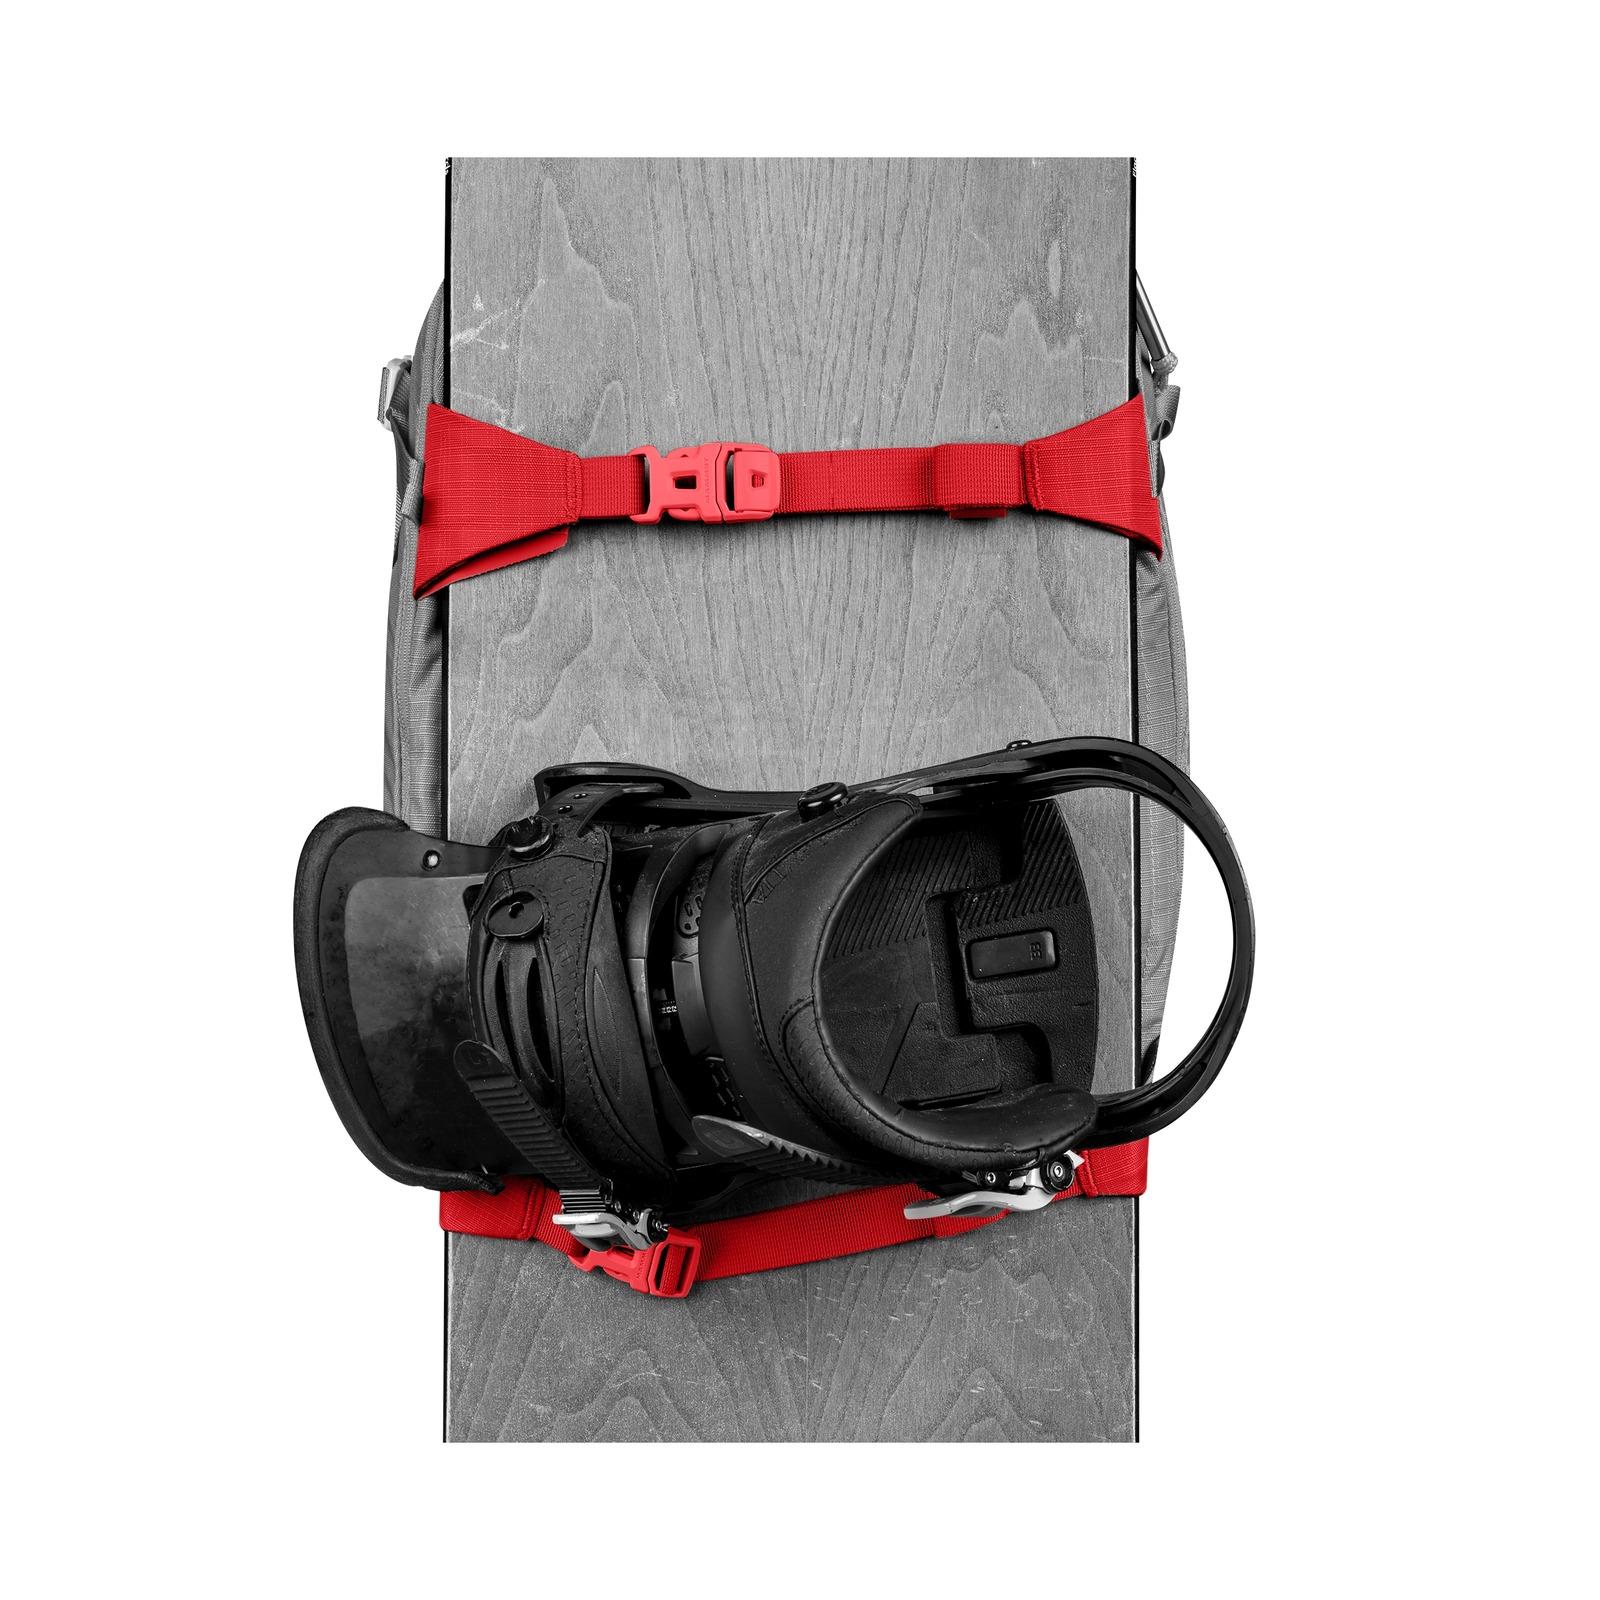 ride-protection-airbag-3-0-13_neutral_det_rgb_1600x1600.jpg